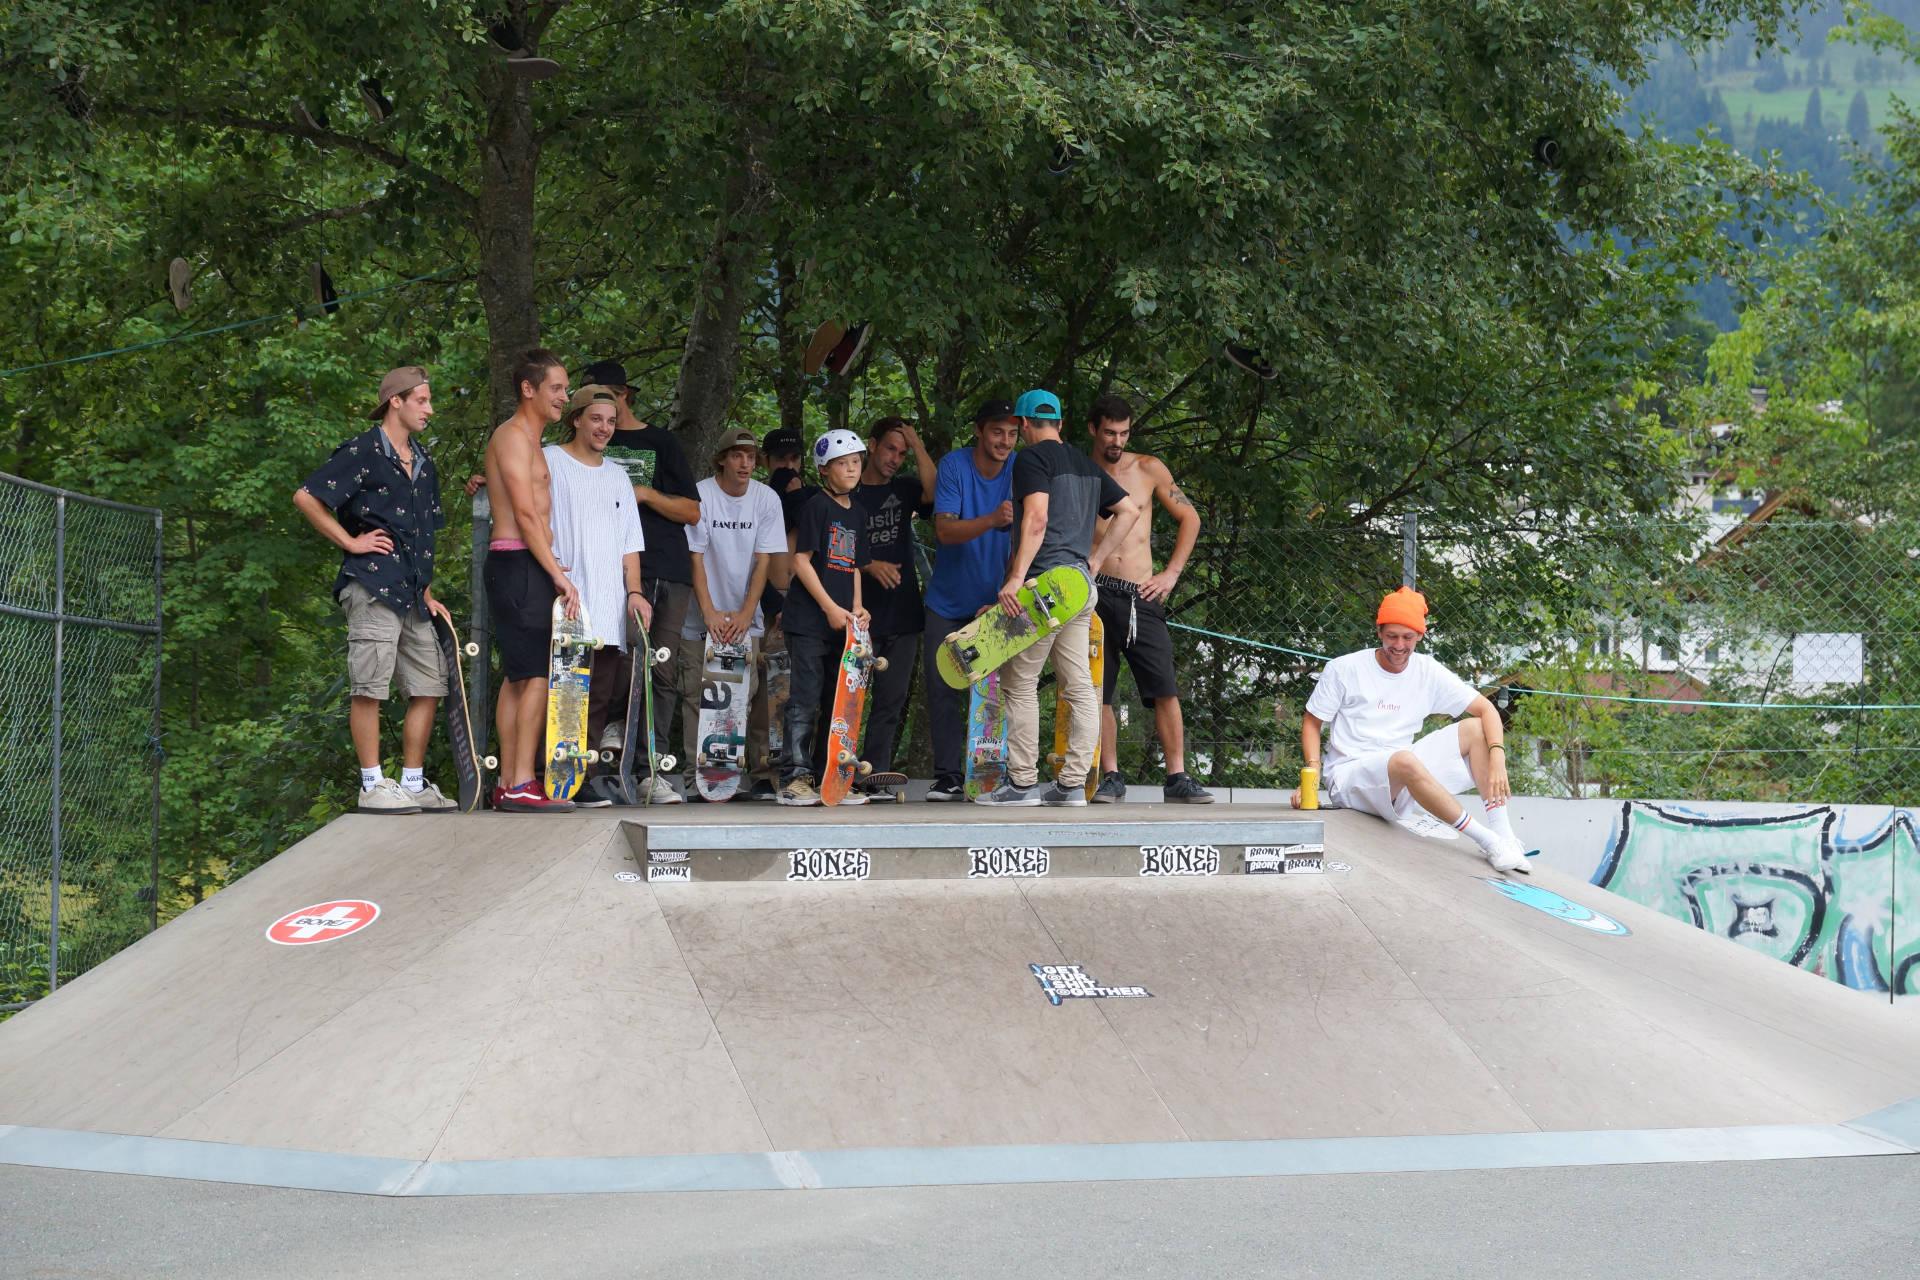 skateboardheadz fieberbrunn kgt 2019 finale 00049